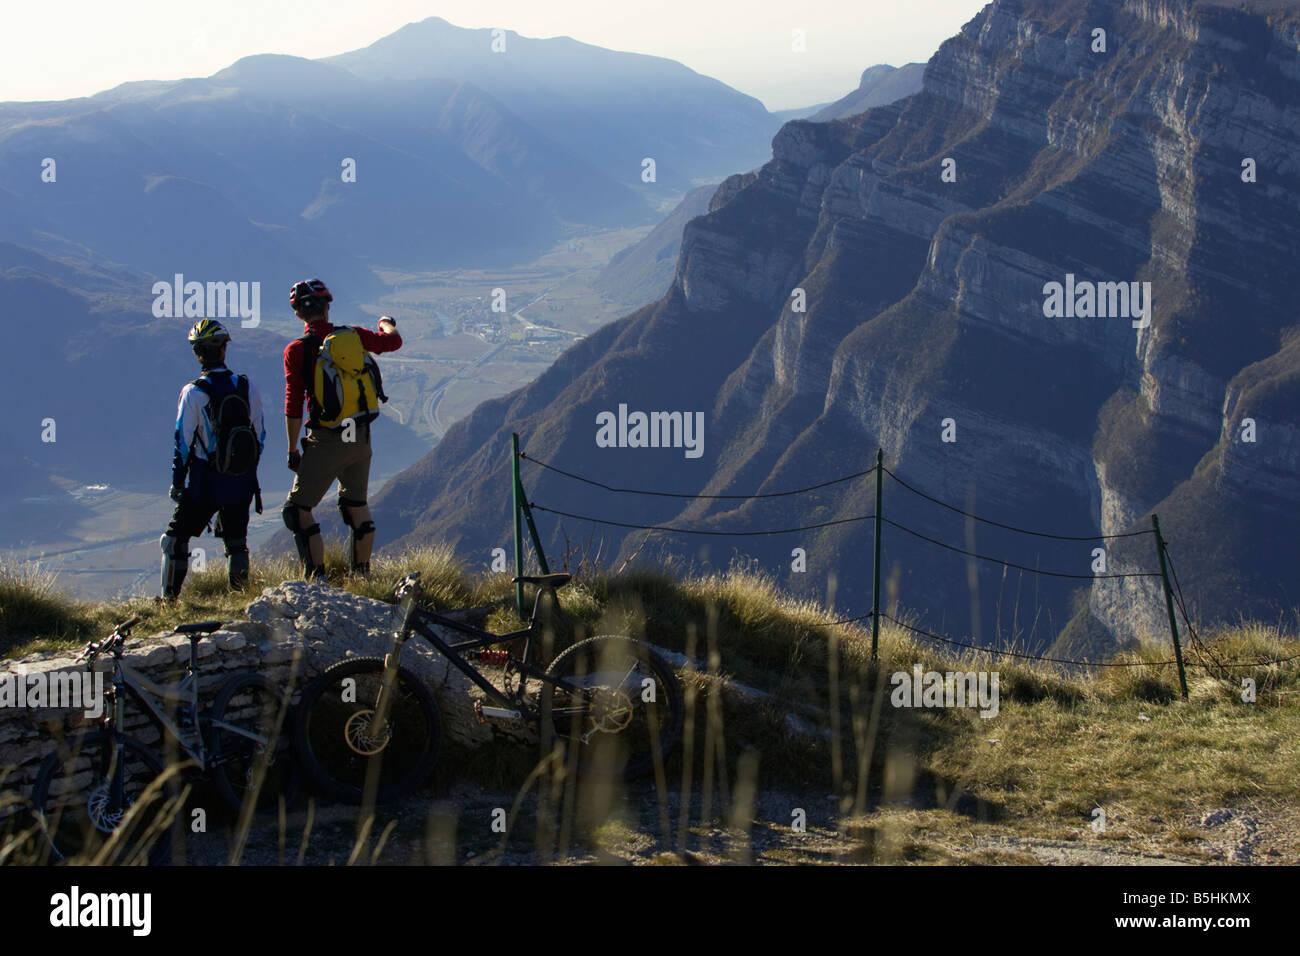 Two mountainbike riders enjoying the sight - Stock Image